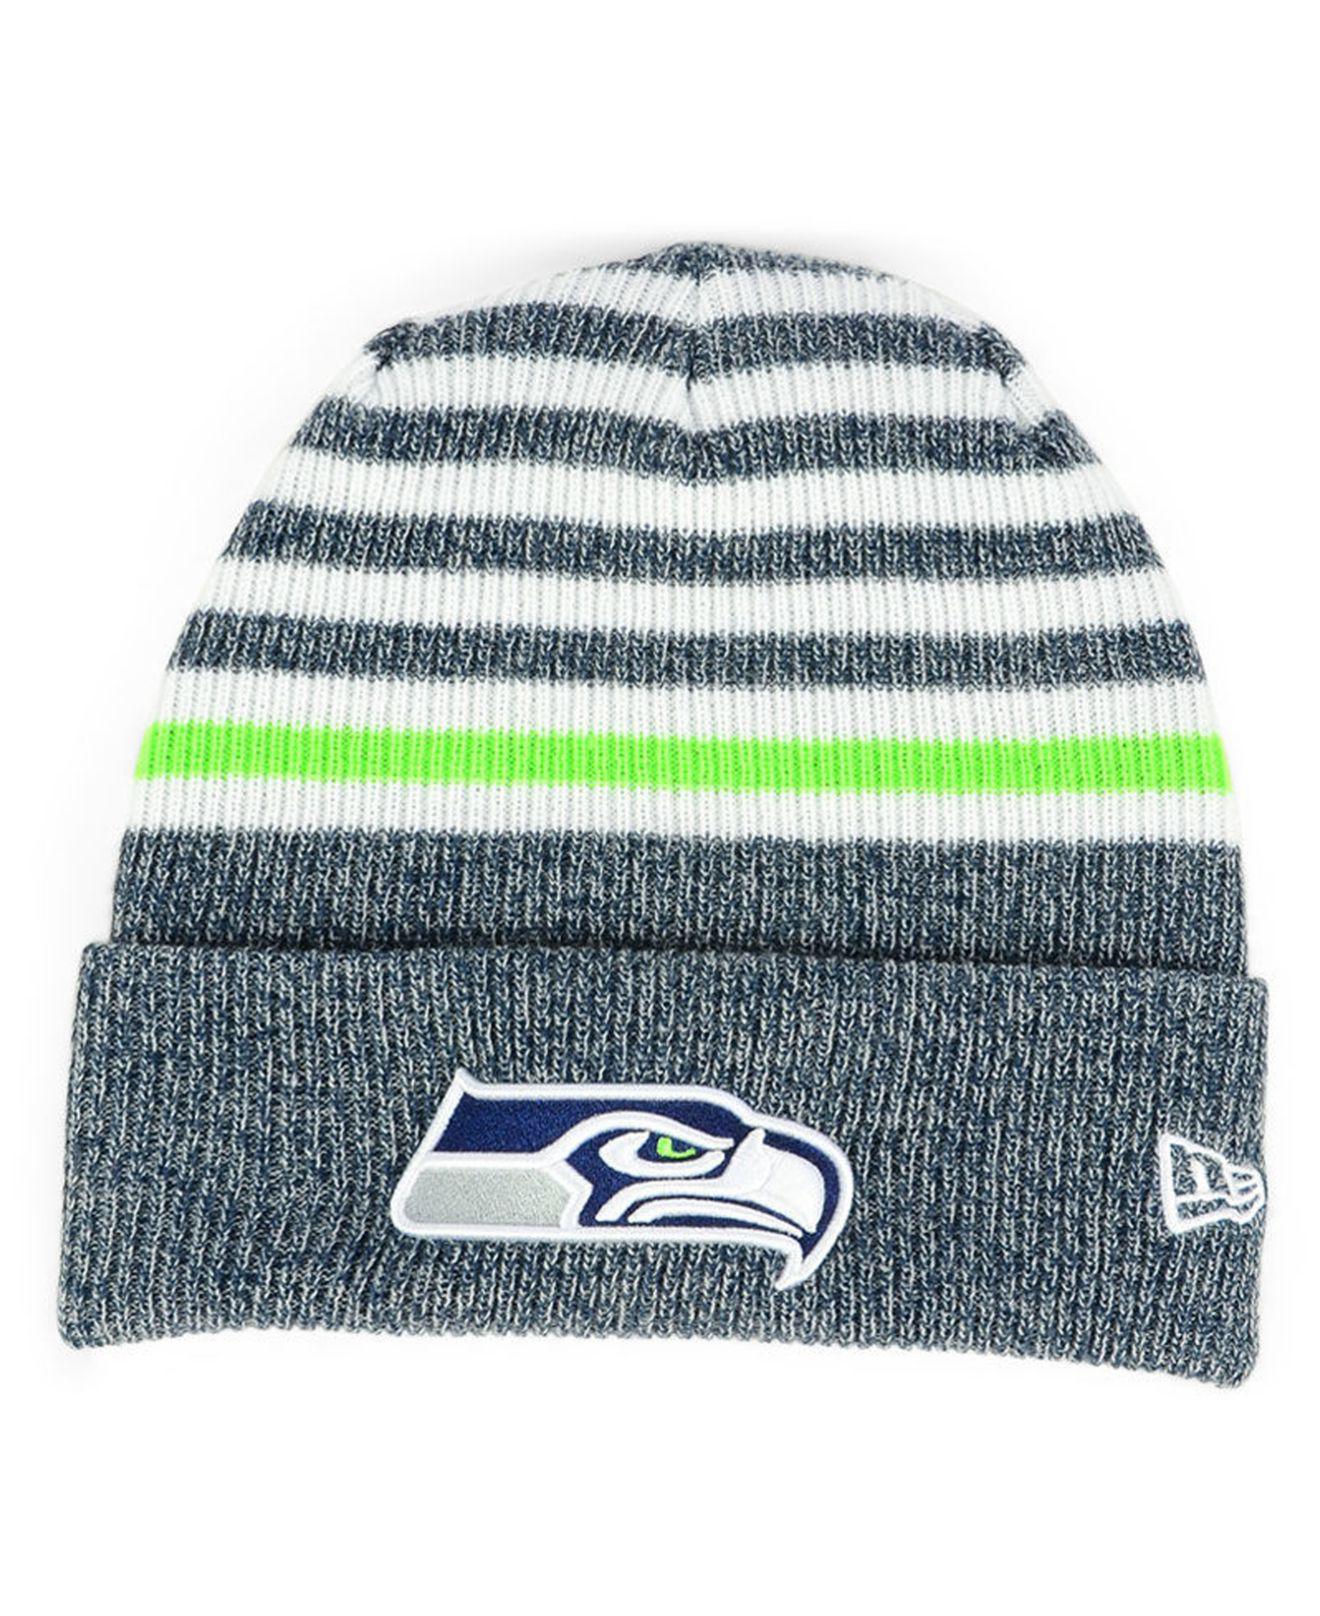 new product 55580 0cf10 Lyst - KTZ Seattle Seahawks Striped2 Cuff Knit Hat in Blue for Men